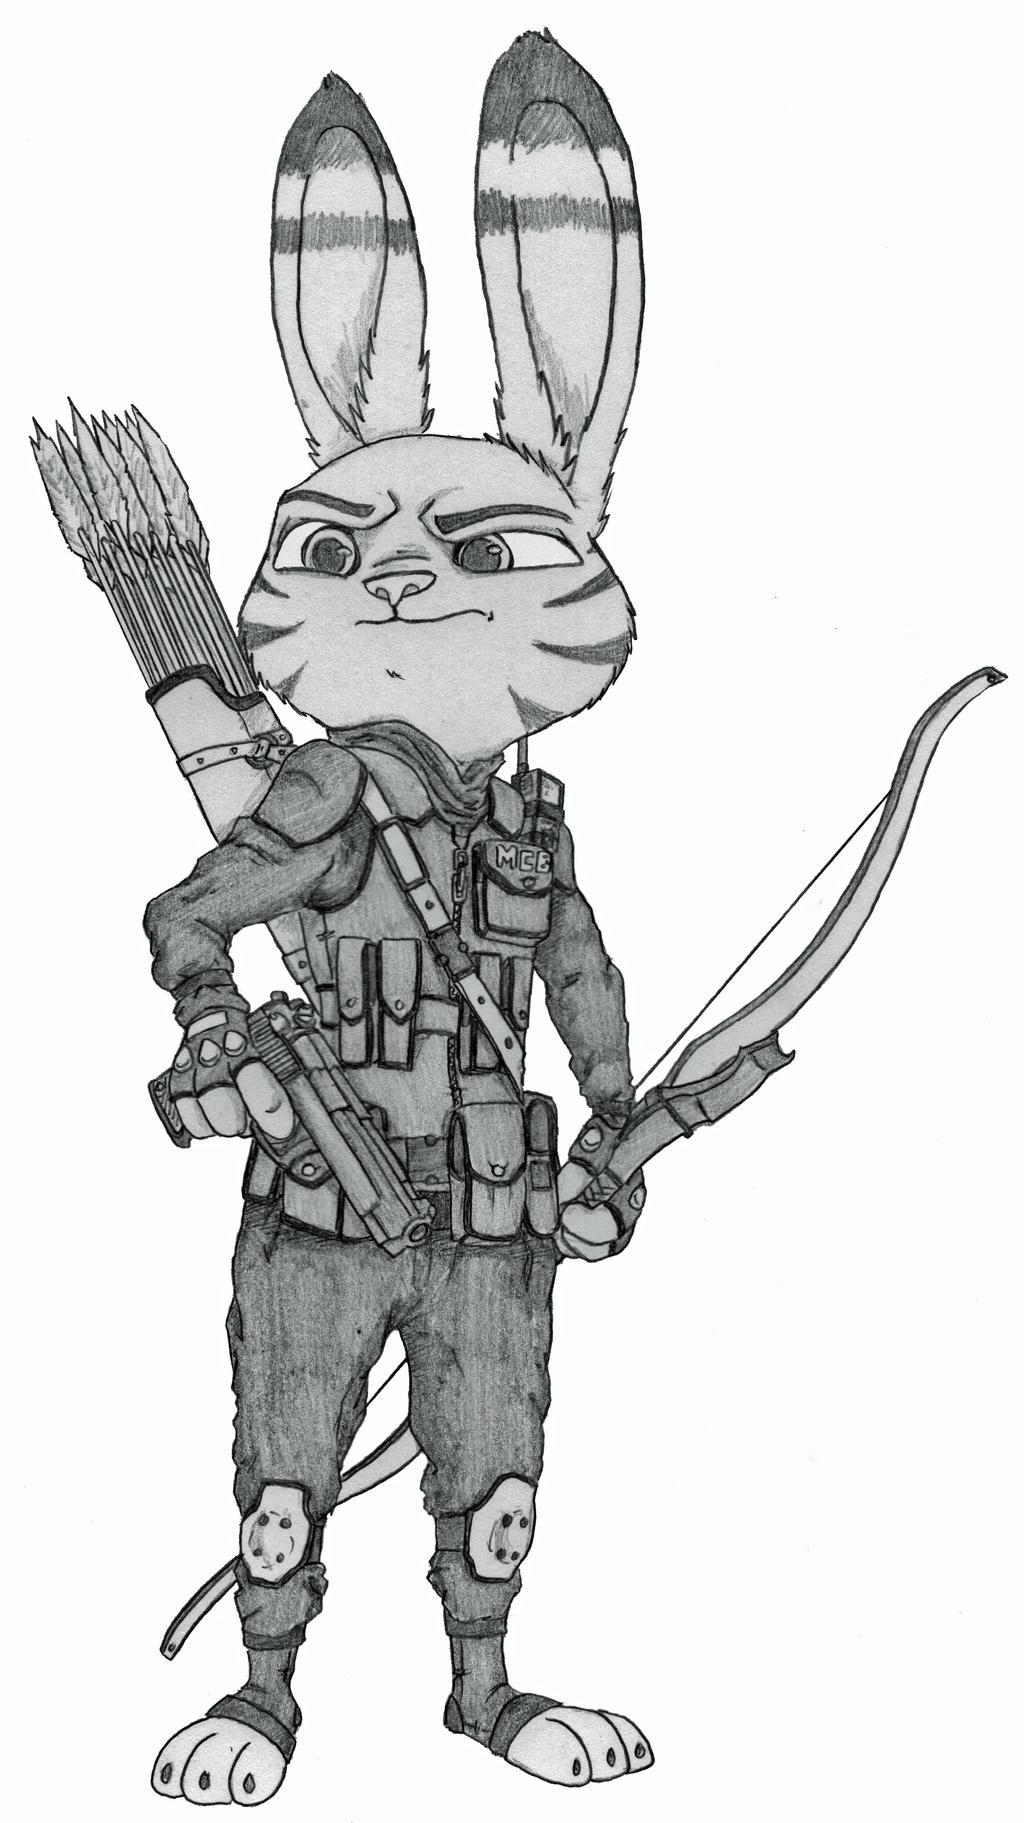 Jack on mission by Ziegelzeig